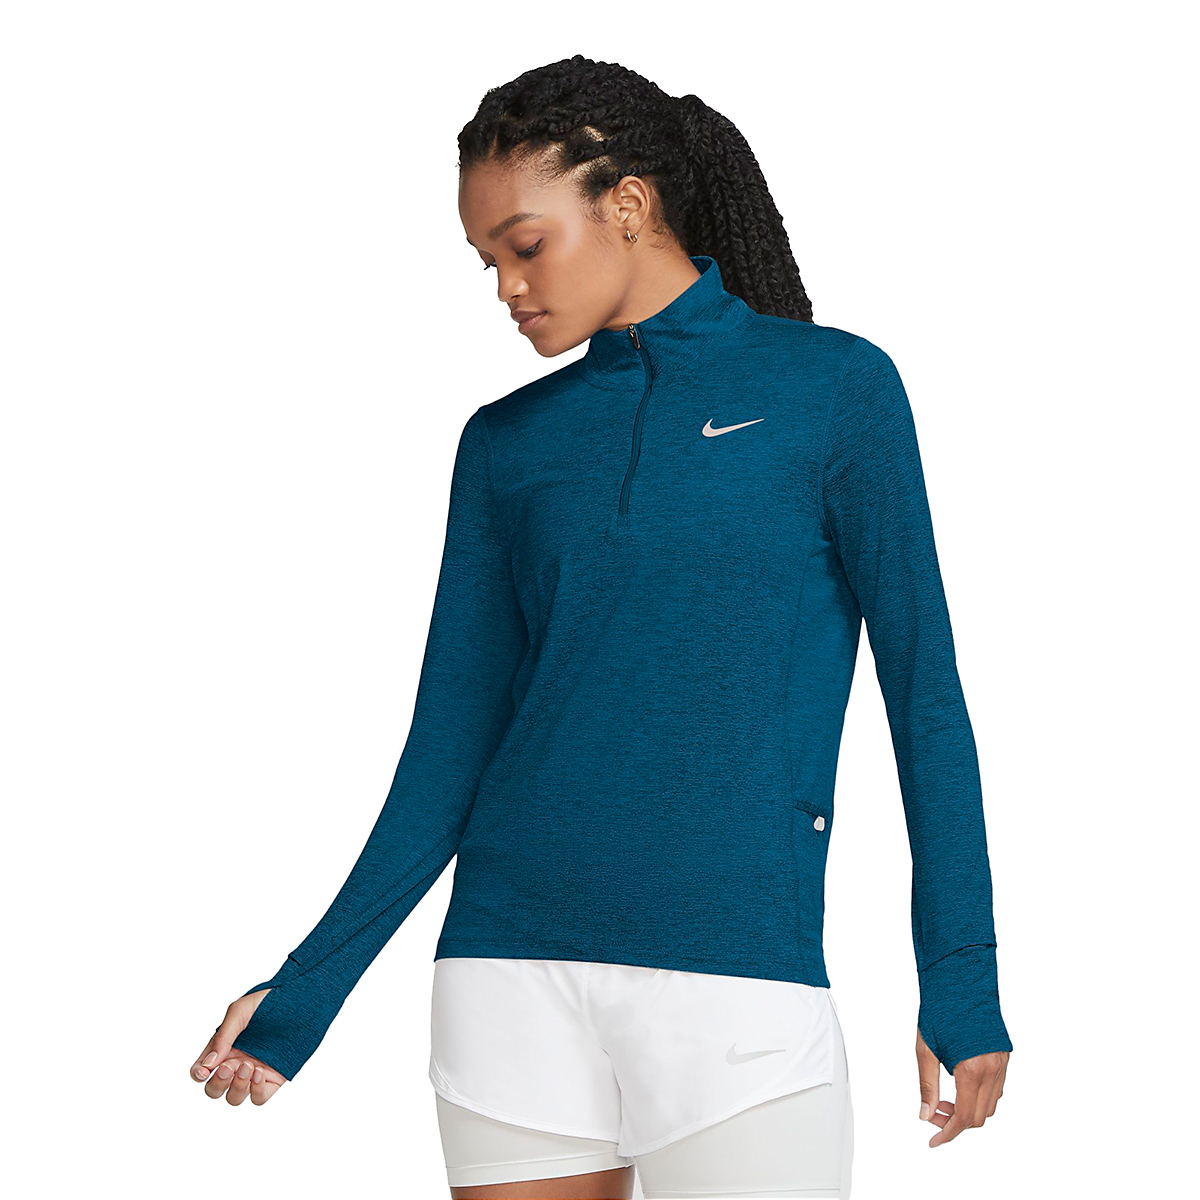 Women's Nike Nike Element 1/2-Zip Running Top - Color: Deep Ocean/Green - Size: XS, Deep Ocean/Green, large, image 1